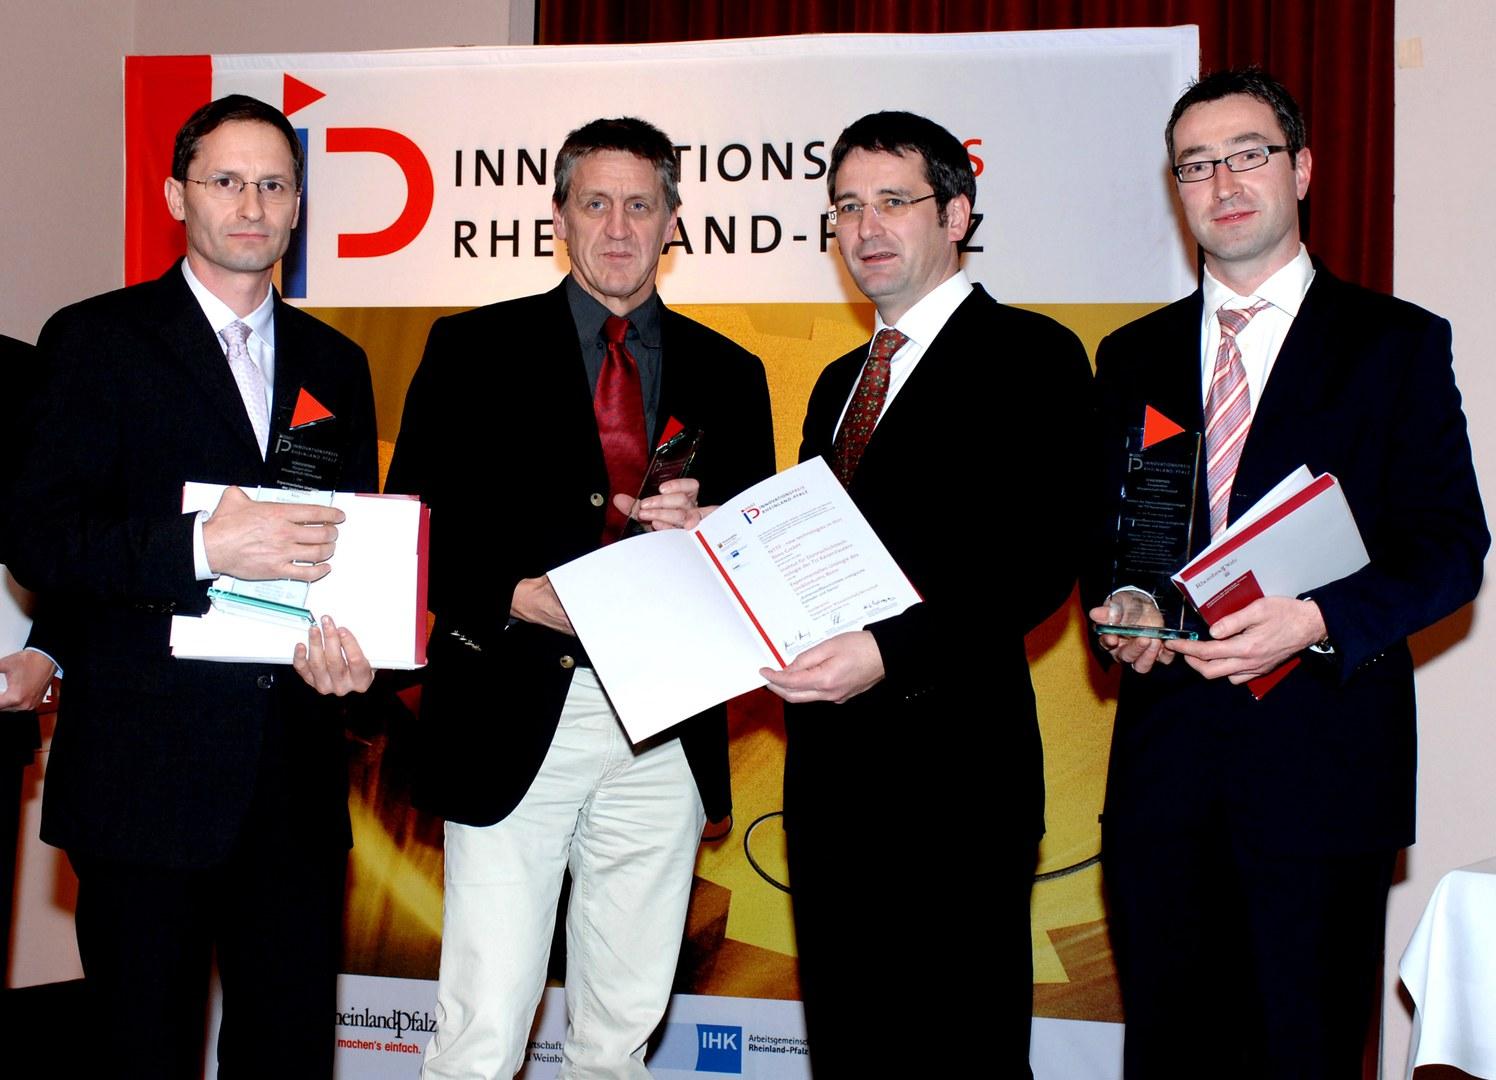 Bild Innovationspreis Rheinland-Pfalz geht auch an Bonner Klinik